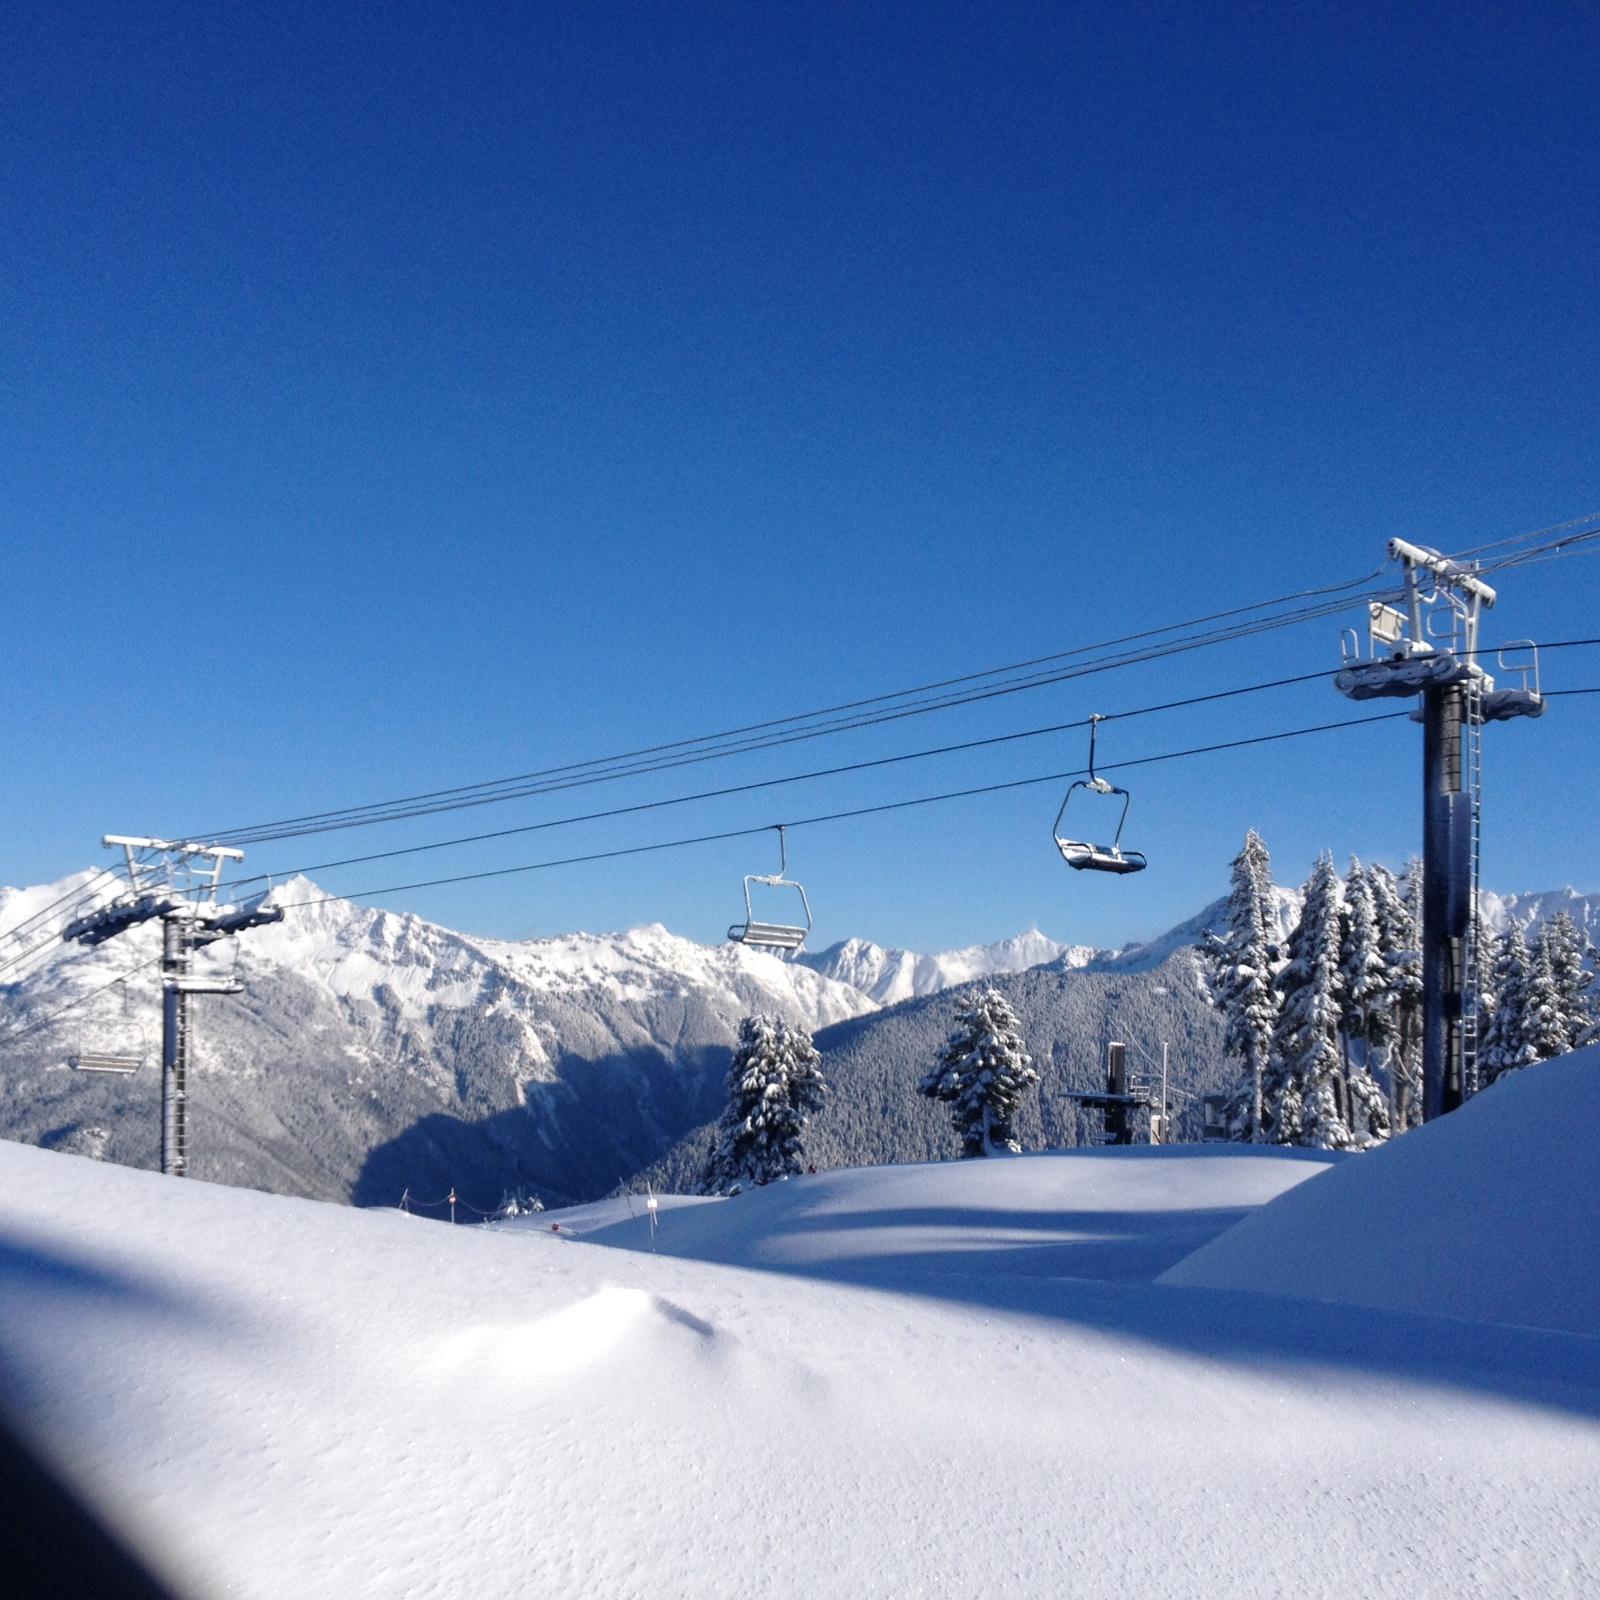 Mt. Baker today, November 29th, 2014